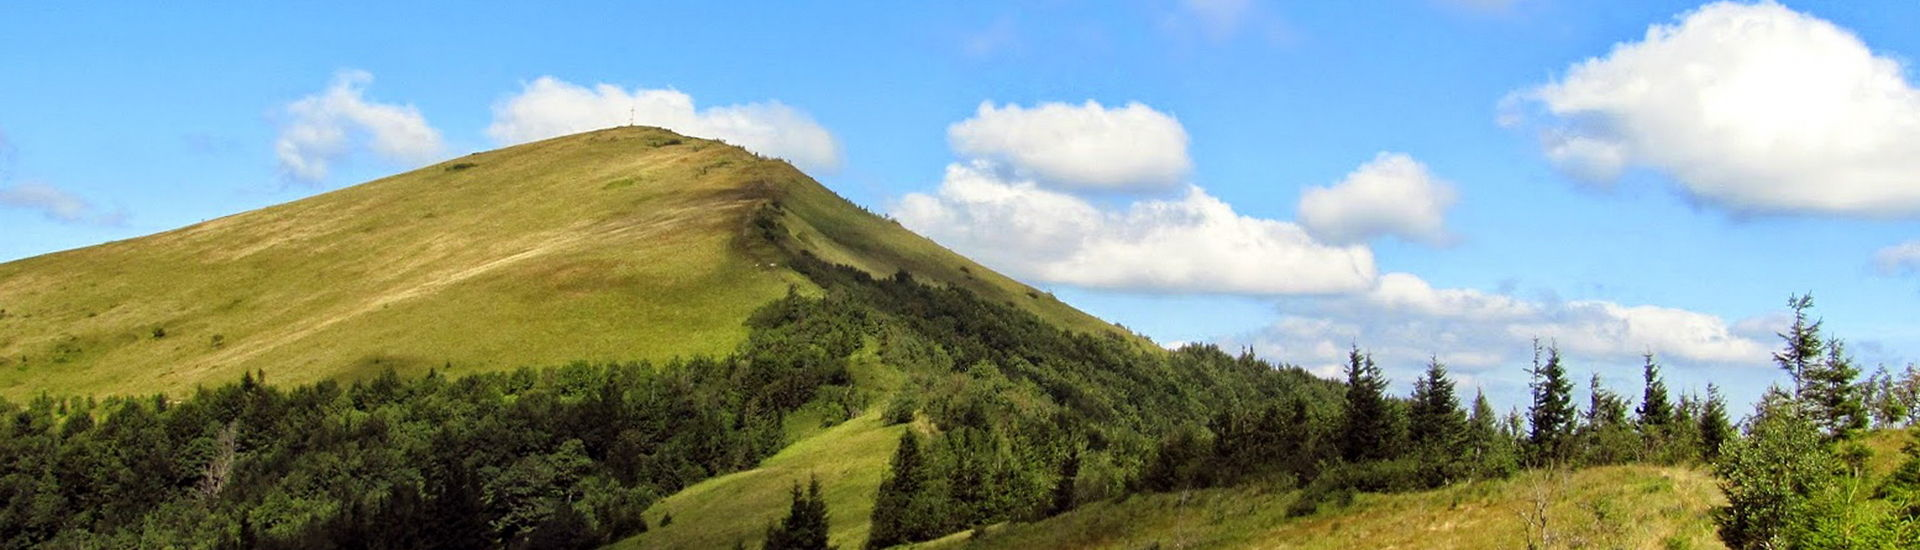 Сколівські Бескиди, гора Парашка